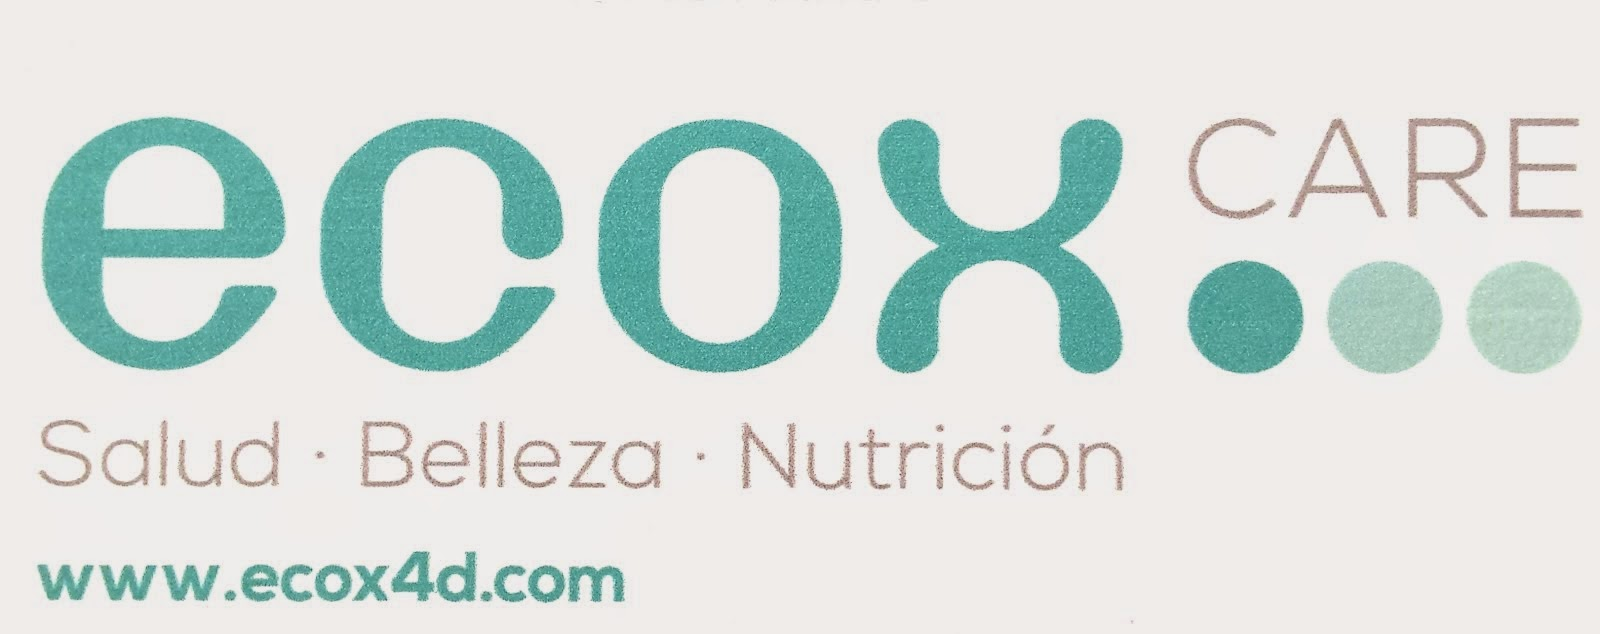 Promo ECOX4D MURCIA: Tarjeta Ecox Care Salud GRATIS con tu Ecografía SOUND